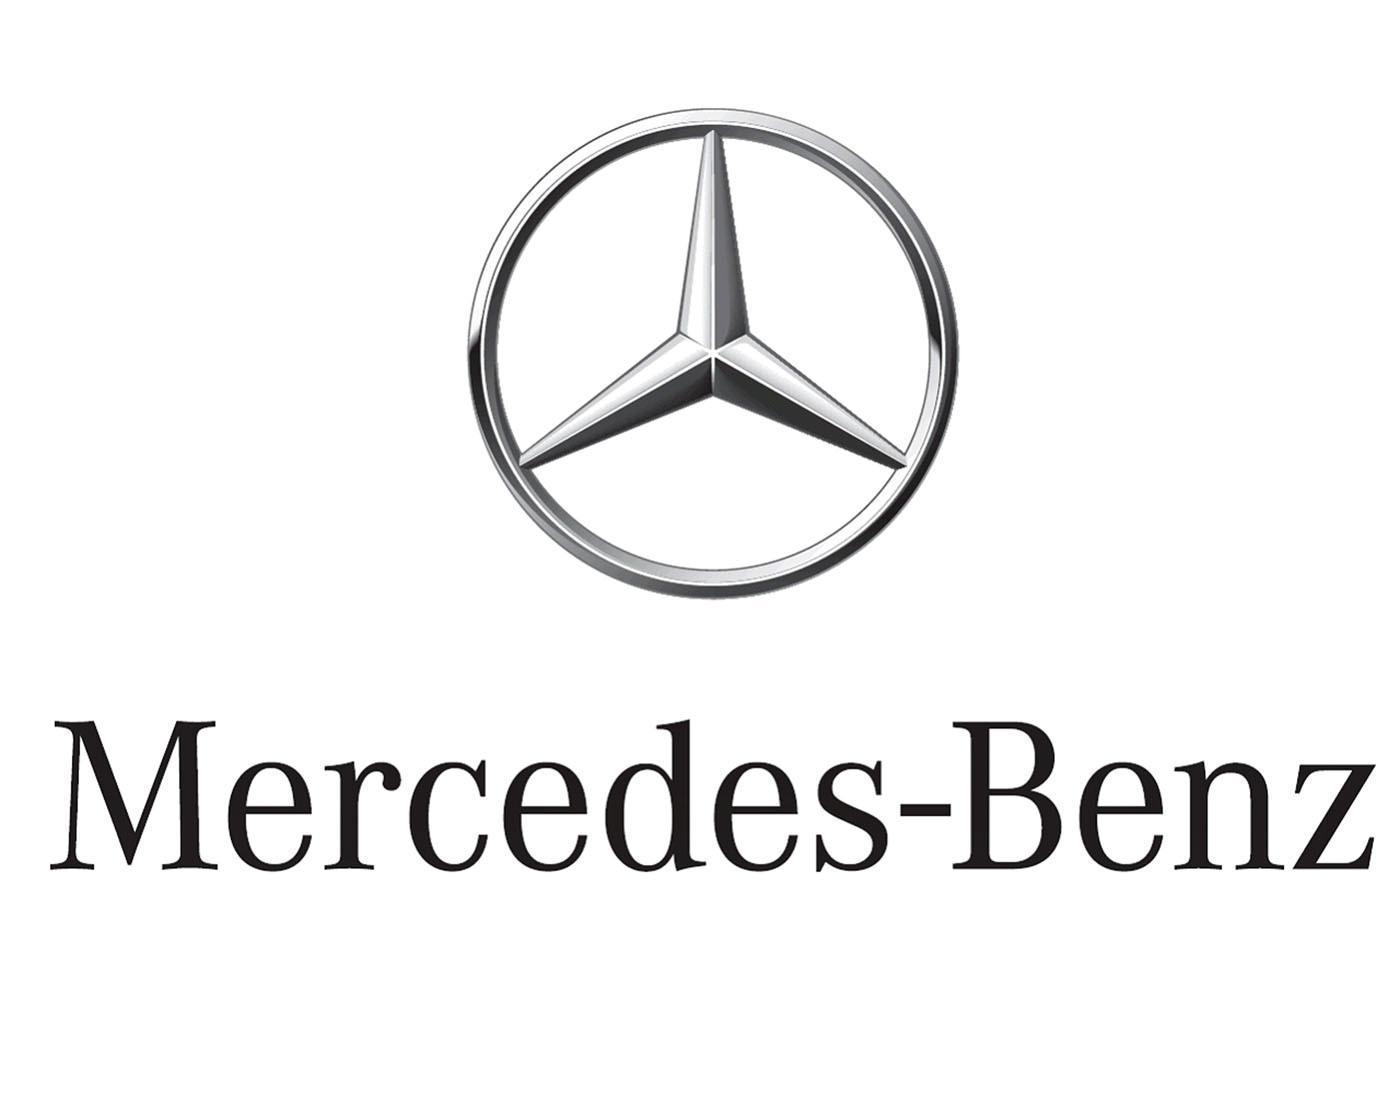 external-image-3088_prn-mercedes-benz-2011-logo-1yhigh-1-jpg-20160722040254-57919aee1a0a1